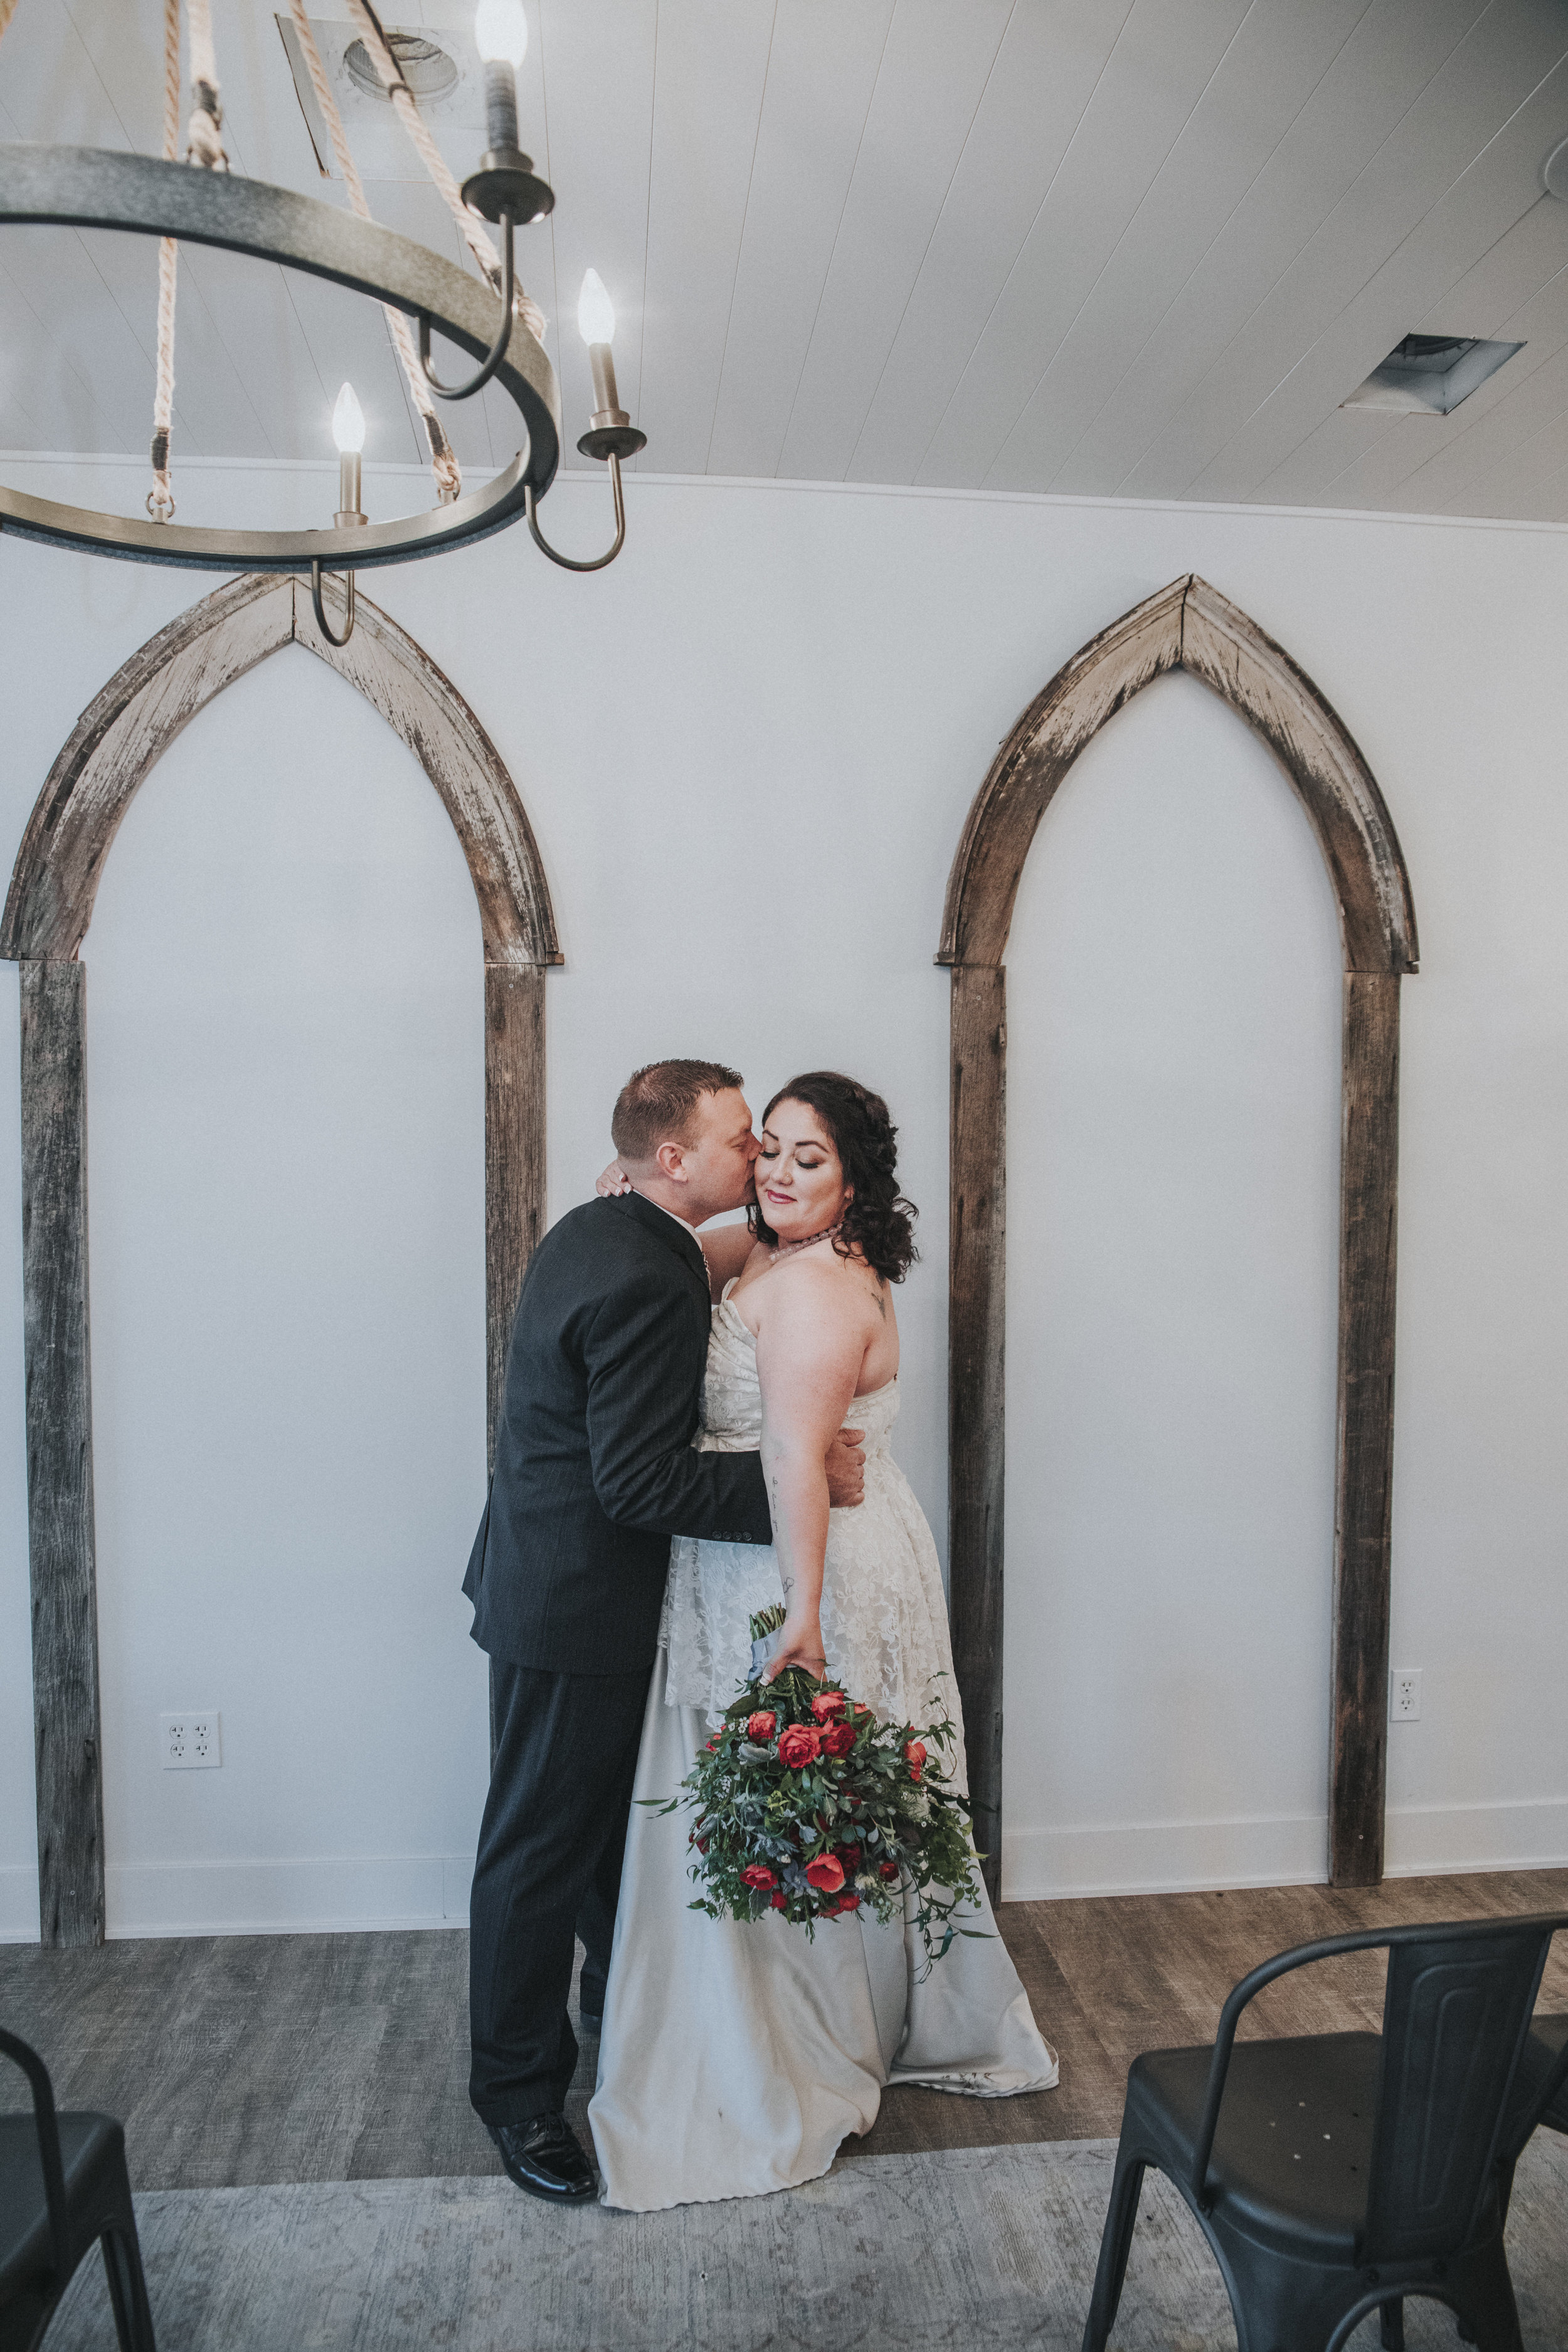 99 midwest-colorado-nebraska-elopement-photography-gretna-turtledoves.jpg